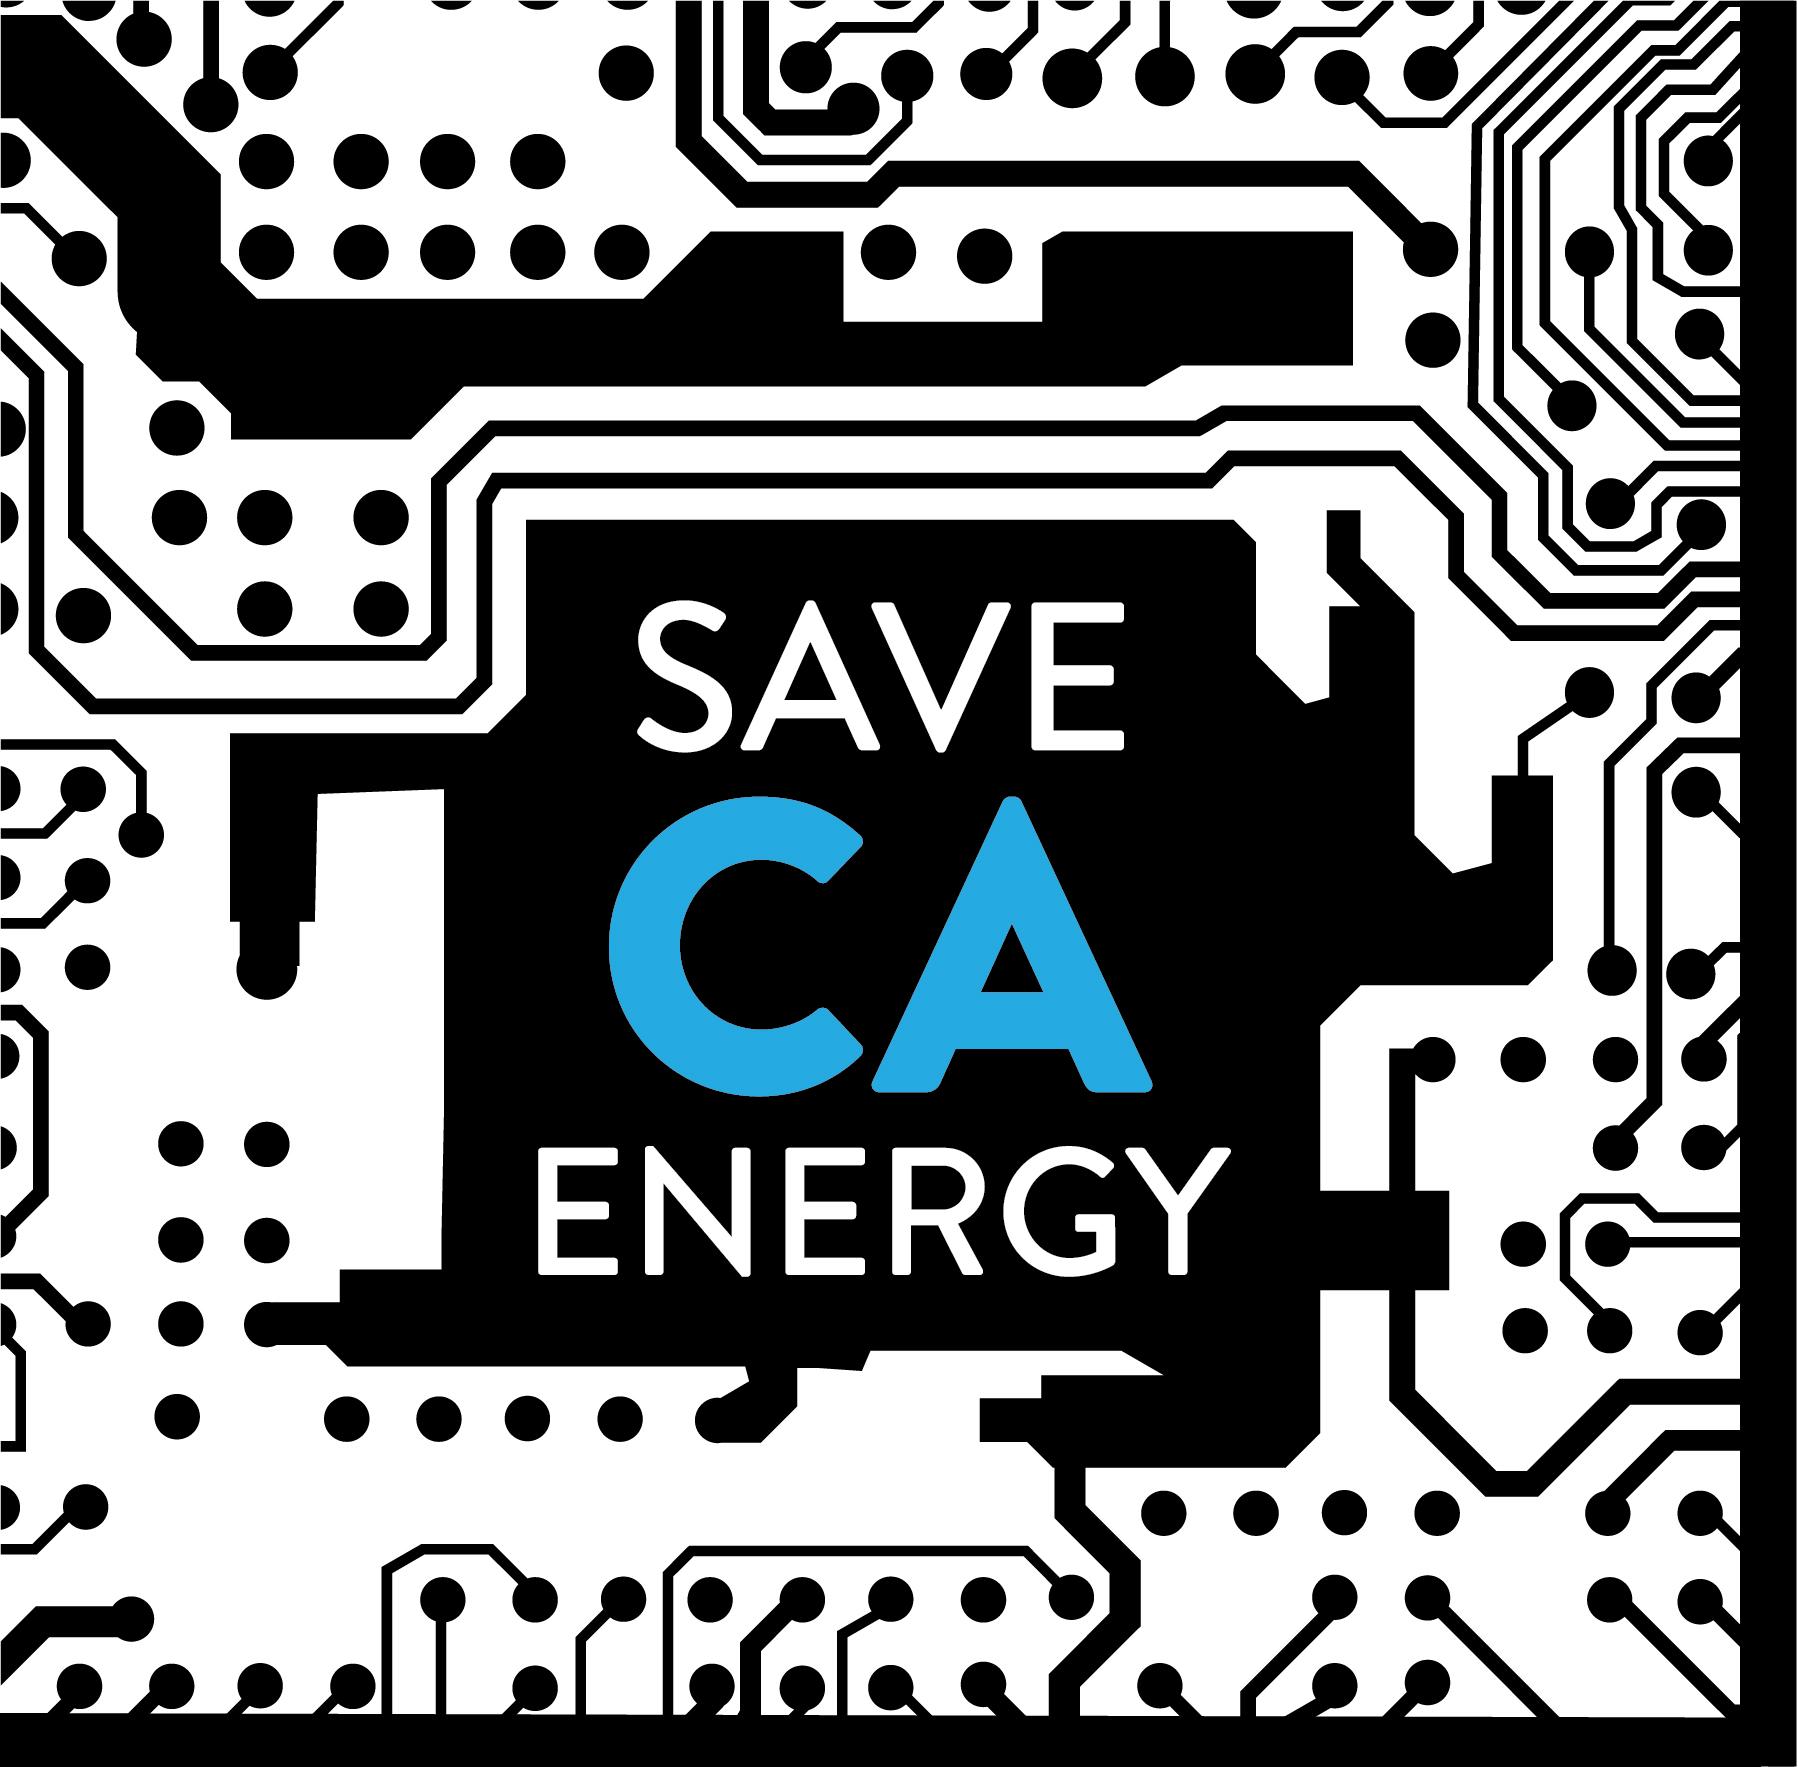 SaveCAEnergy-7_Brand Mark BIG.jpg